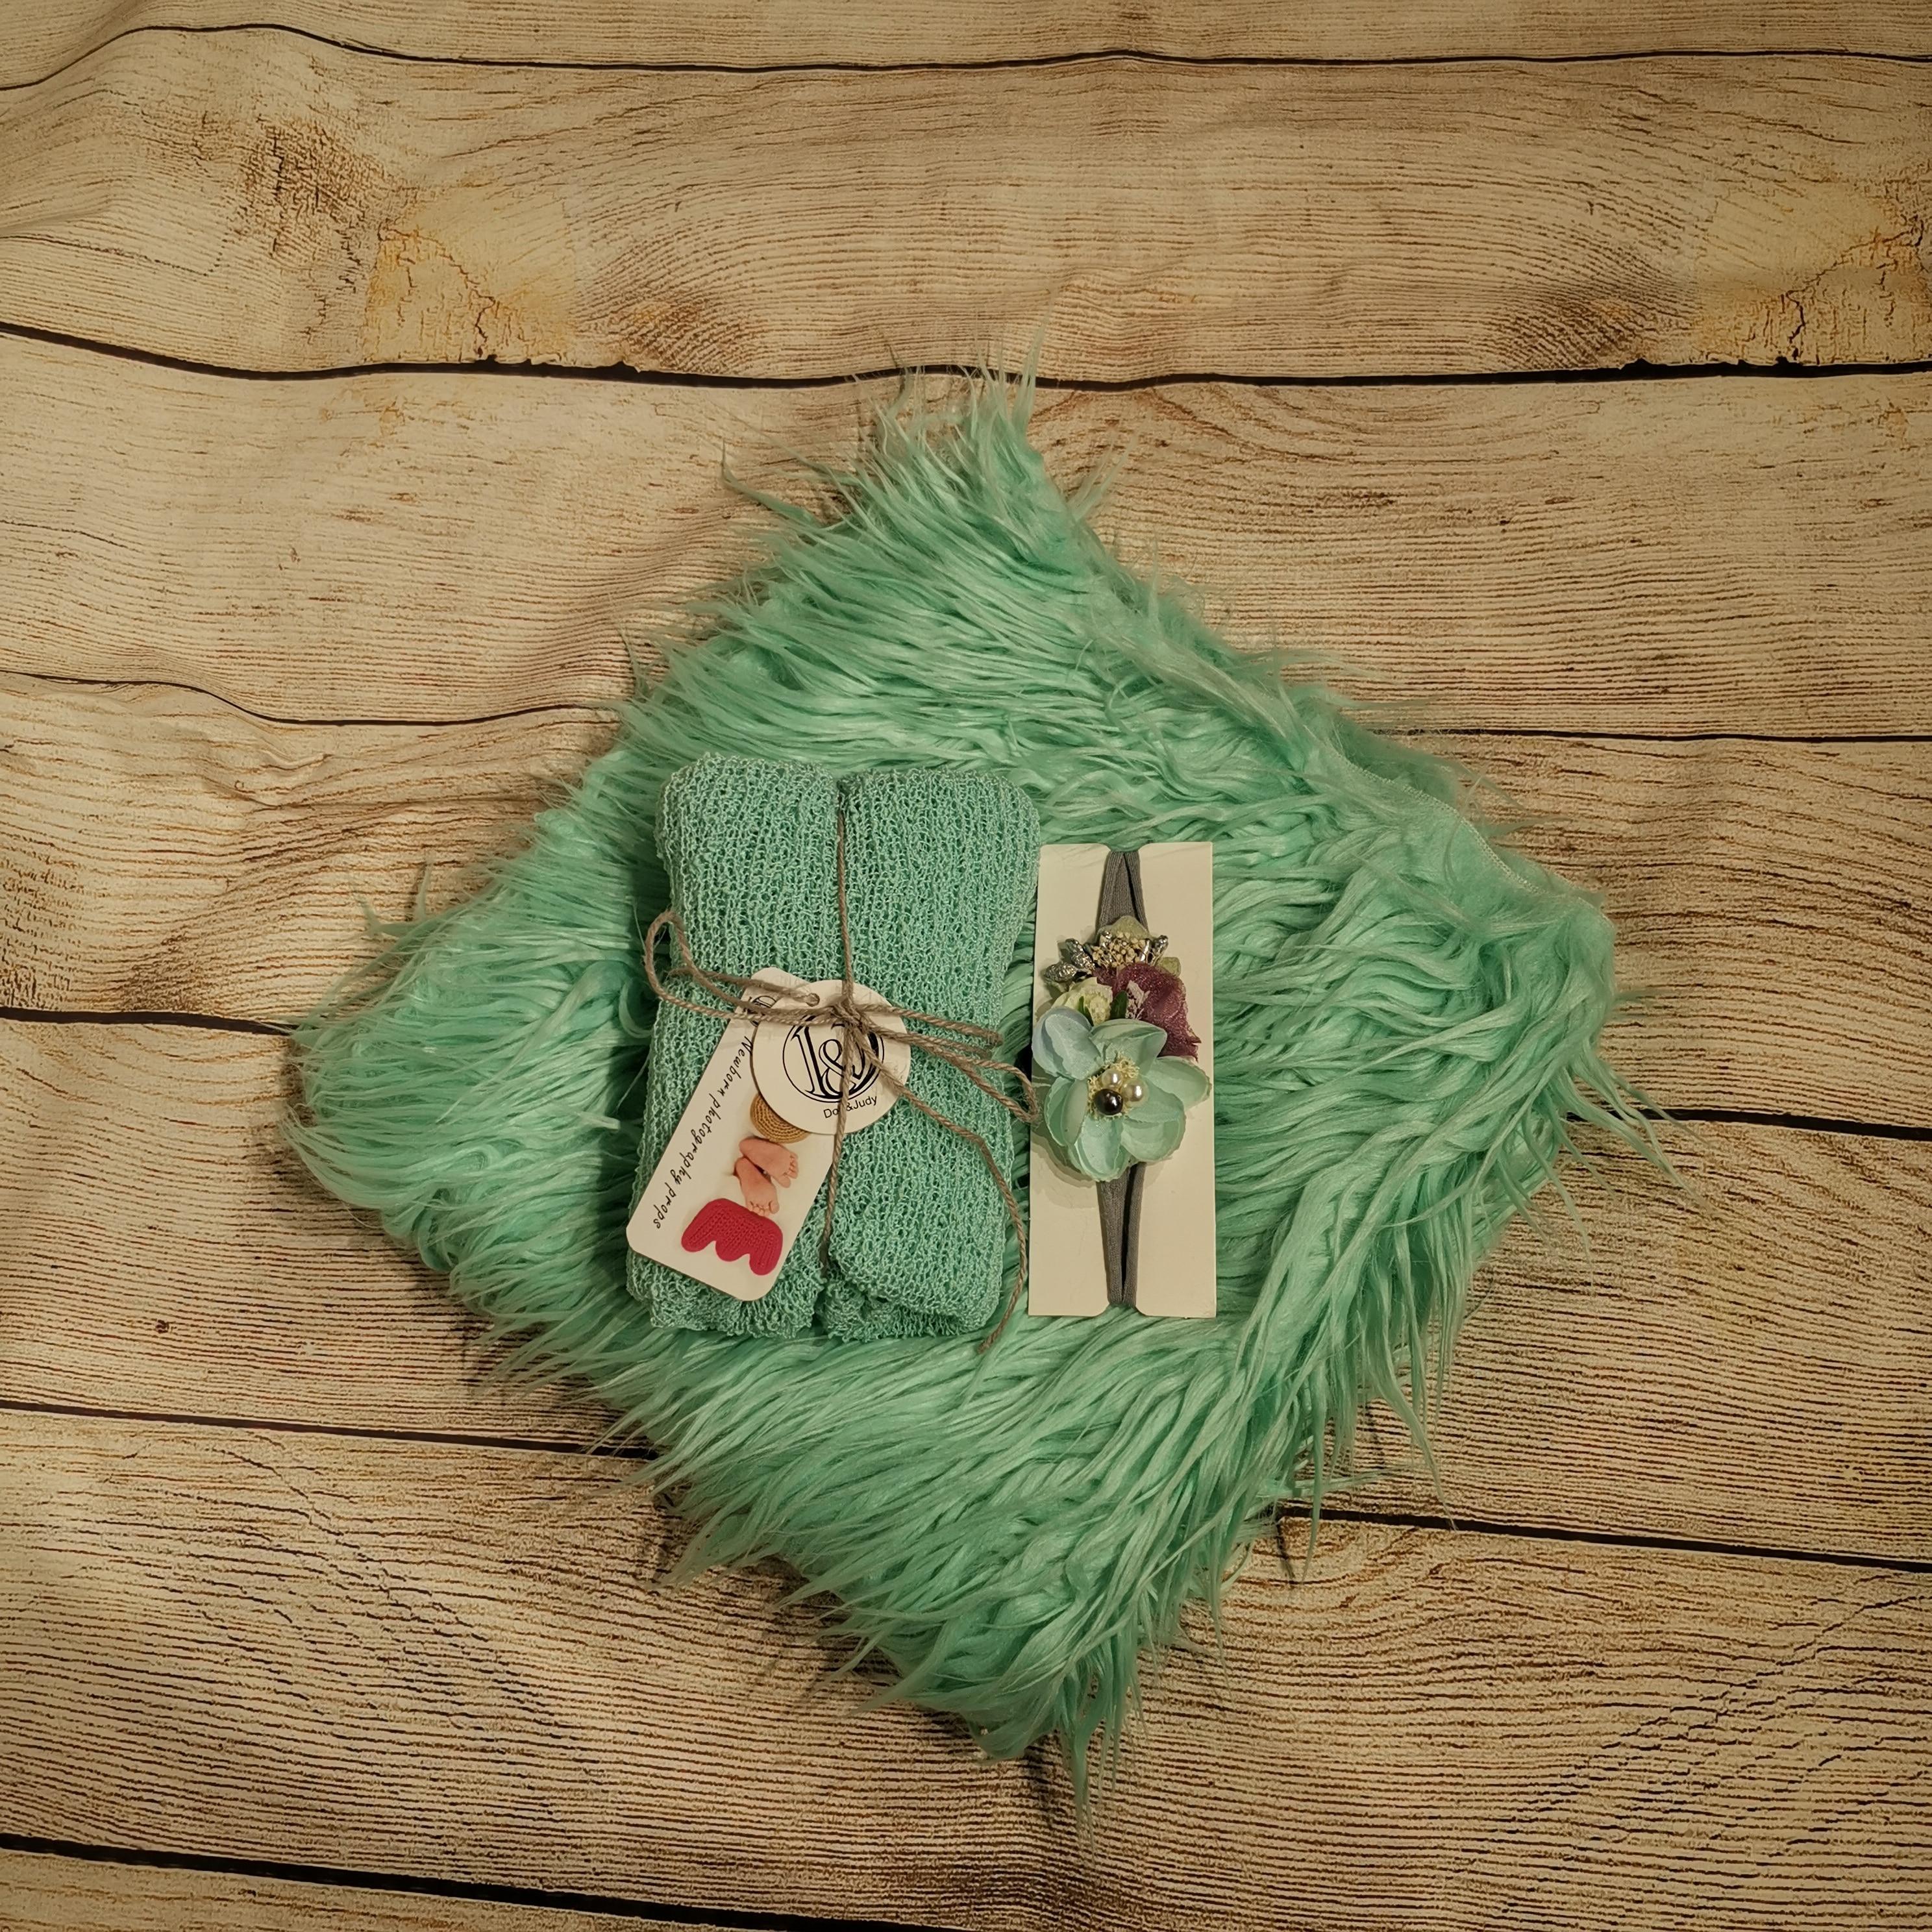 75*50cm Soft Long Pile Faux Fur MONGOLIAN FUR Blanket +140*30cm Stretch Knit Wrap +matched Cotton headband for Newborn Shooting